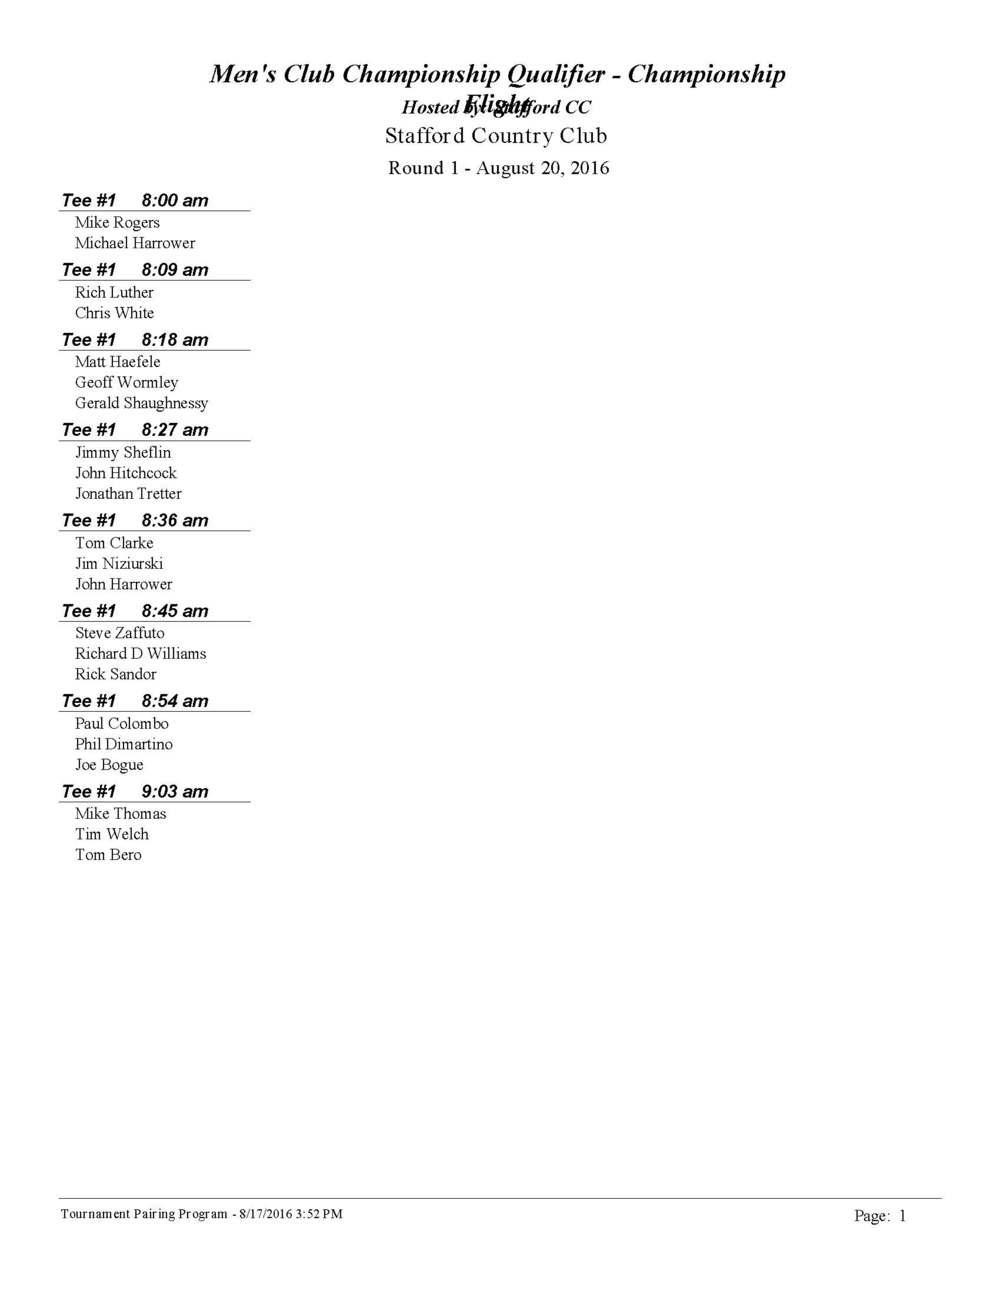 Men's Club Championship Qualifier Tee Times Rd. 1 August 20, 2016